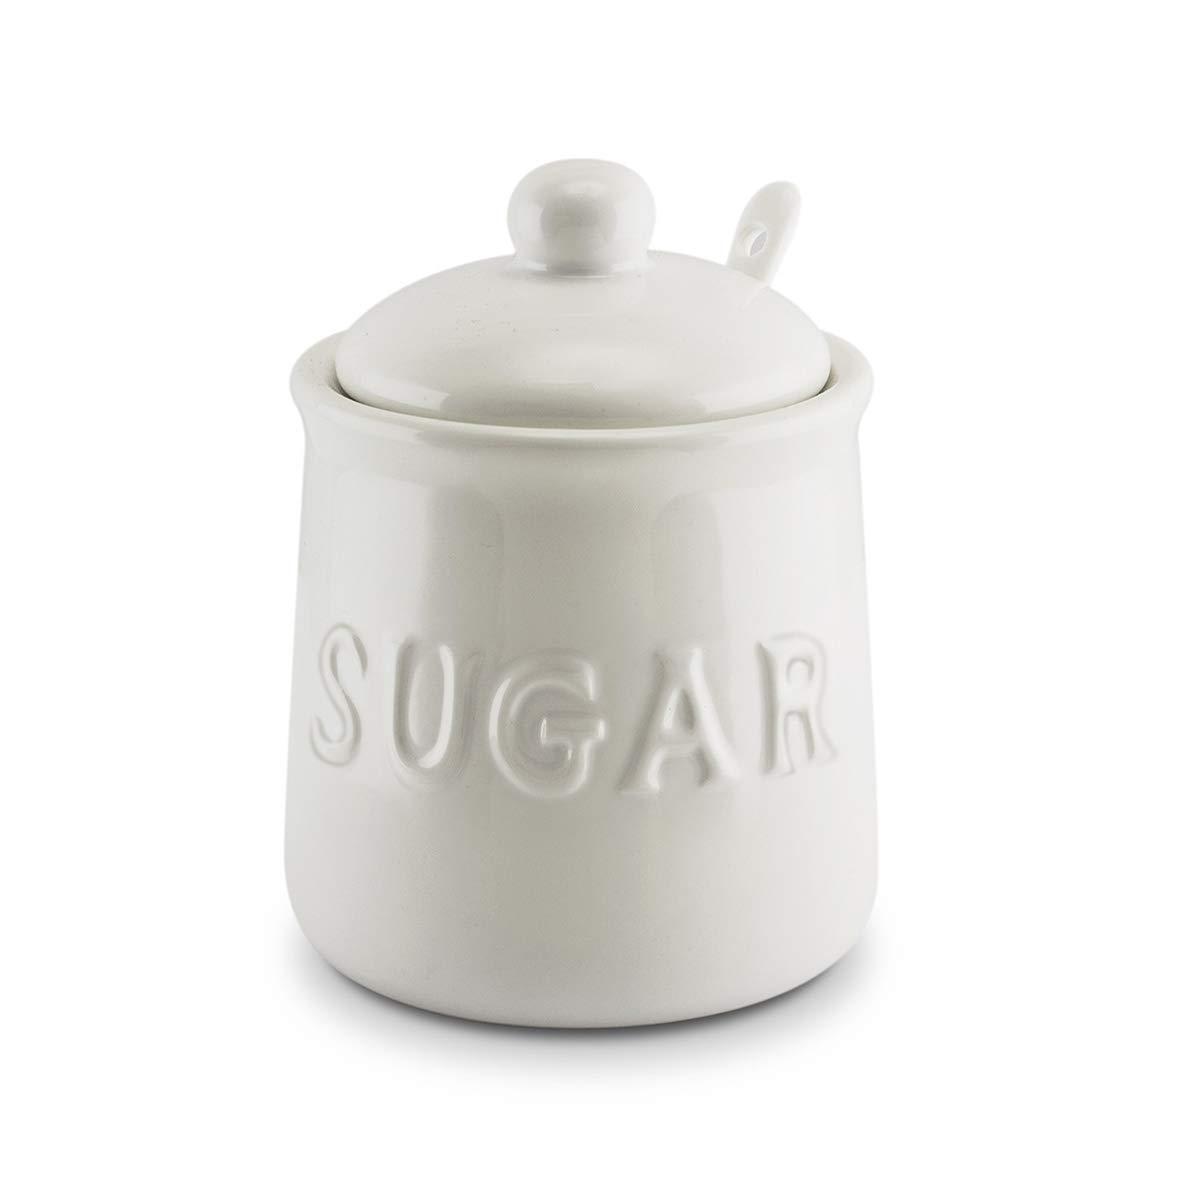 KOVOT 10 oz Ceramic Sugar Jar & Spoon Set | White